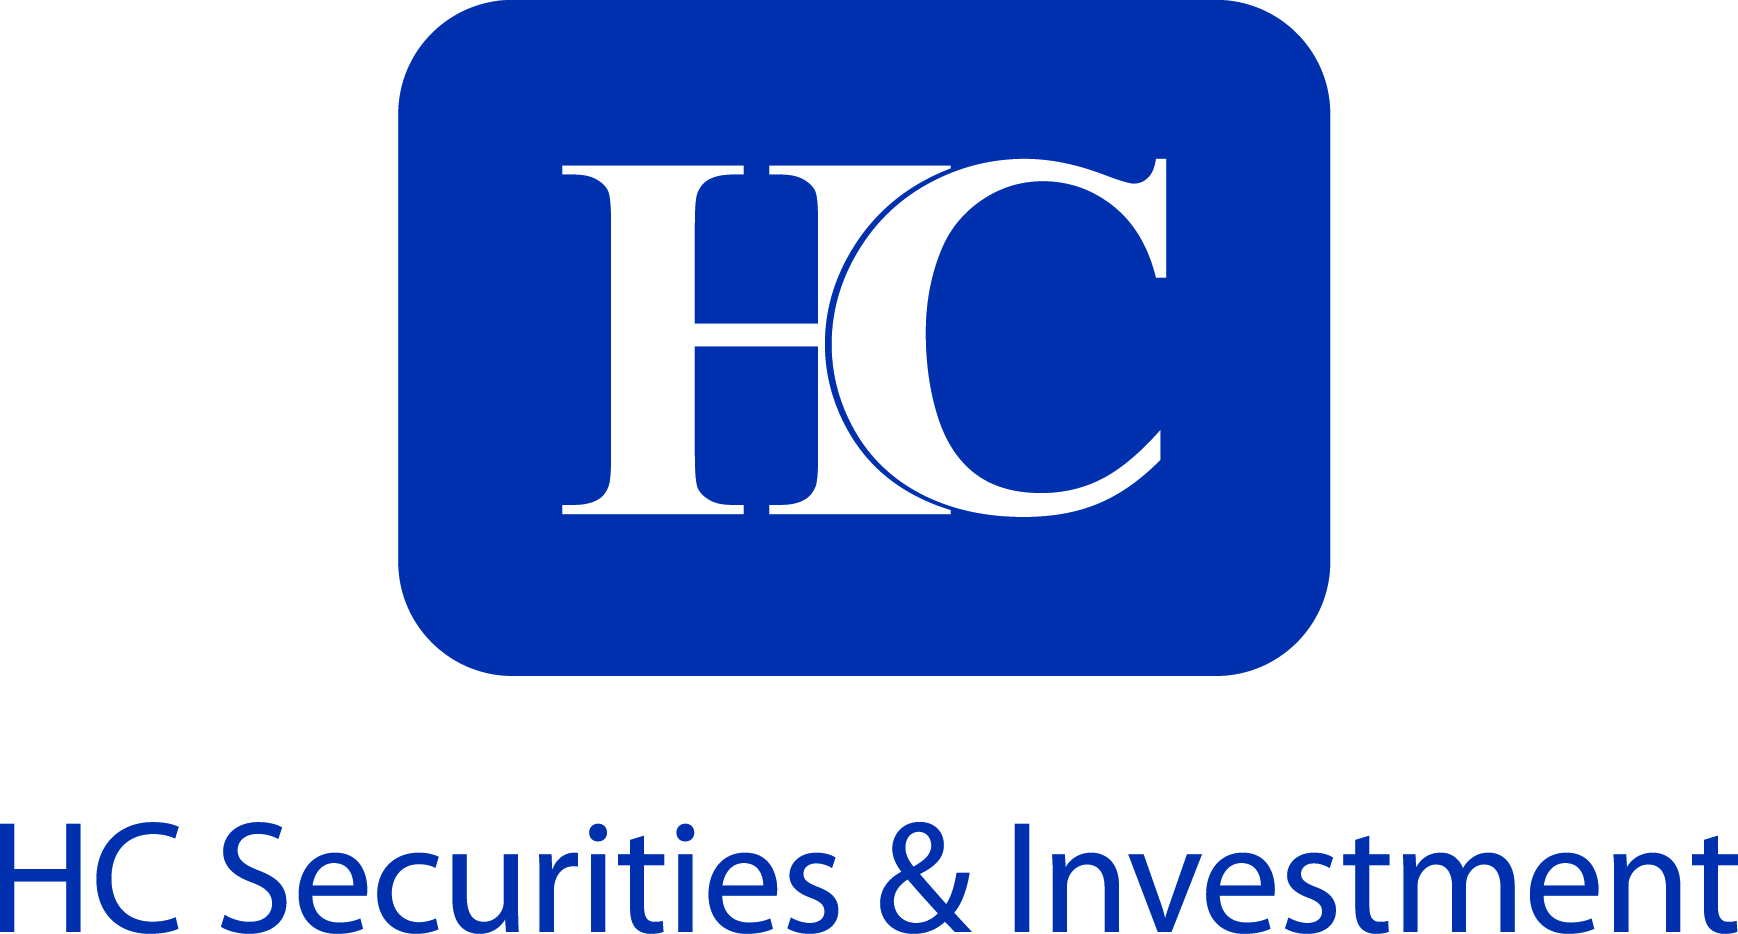 HC Securities & Investment logo